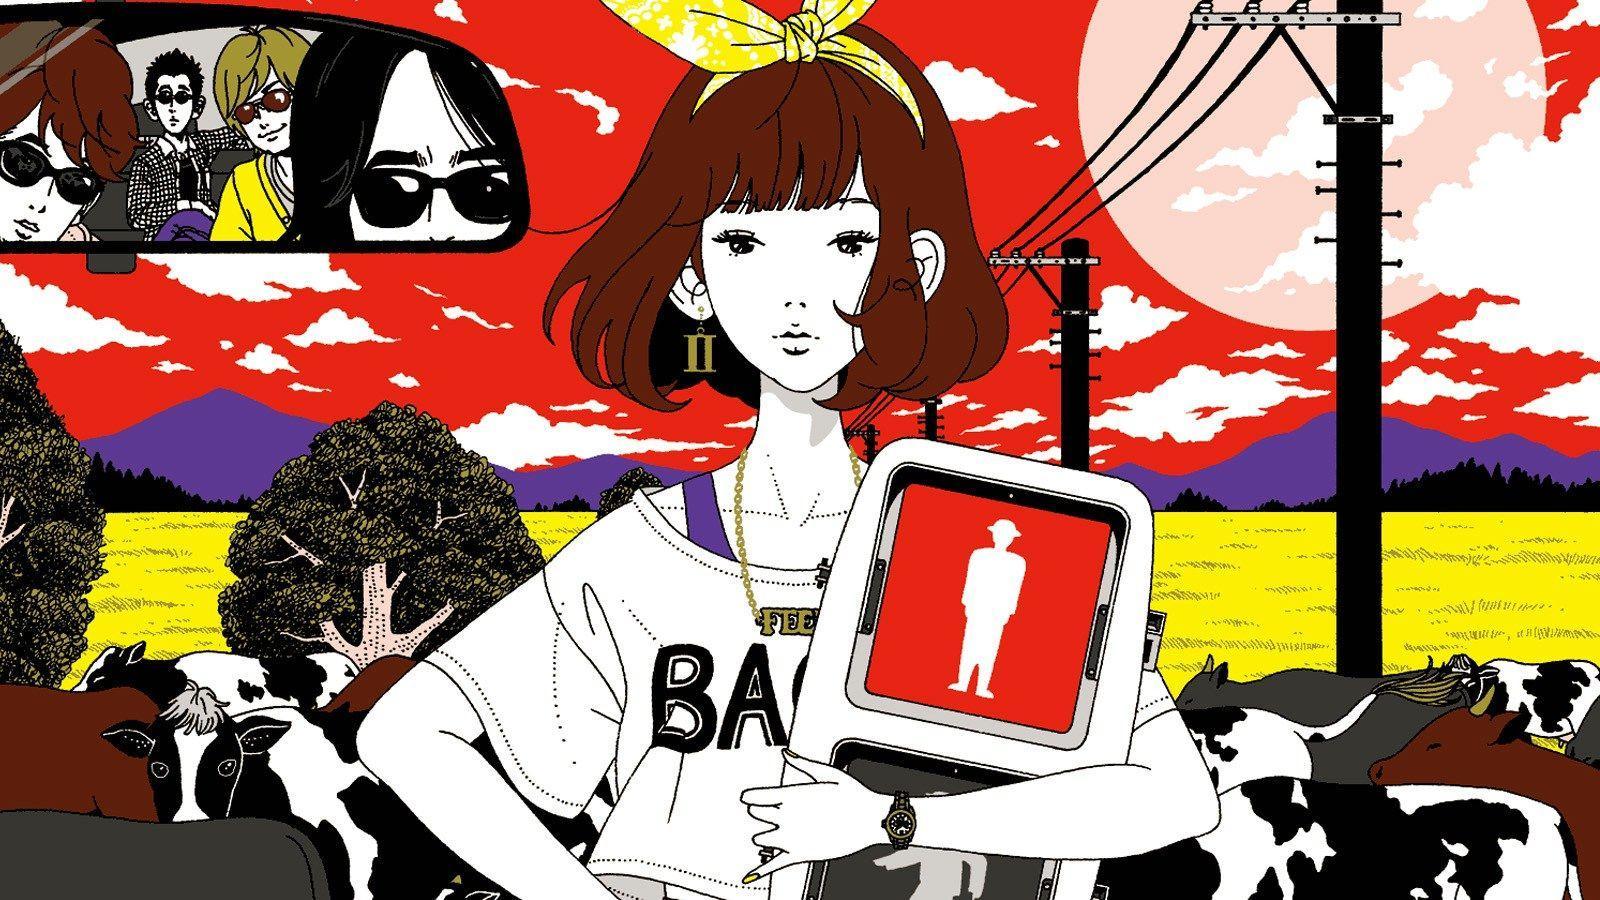 Yusuke Nakamura Wallpapers Top Free Yusuke Nakamura Backgrounds Wallpaperaccess